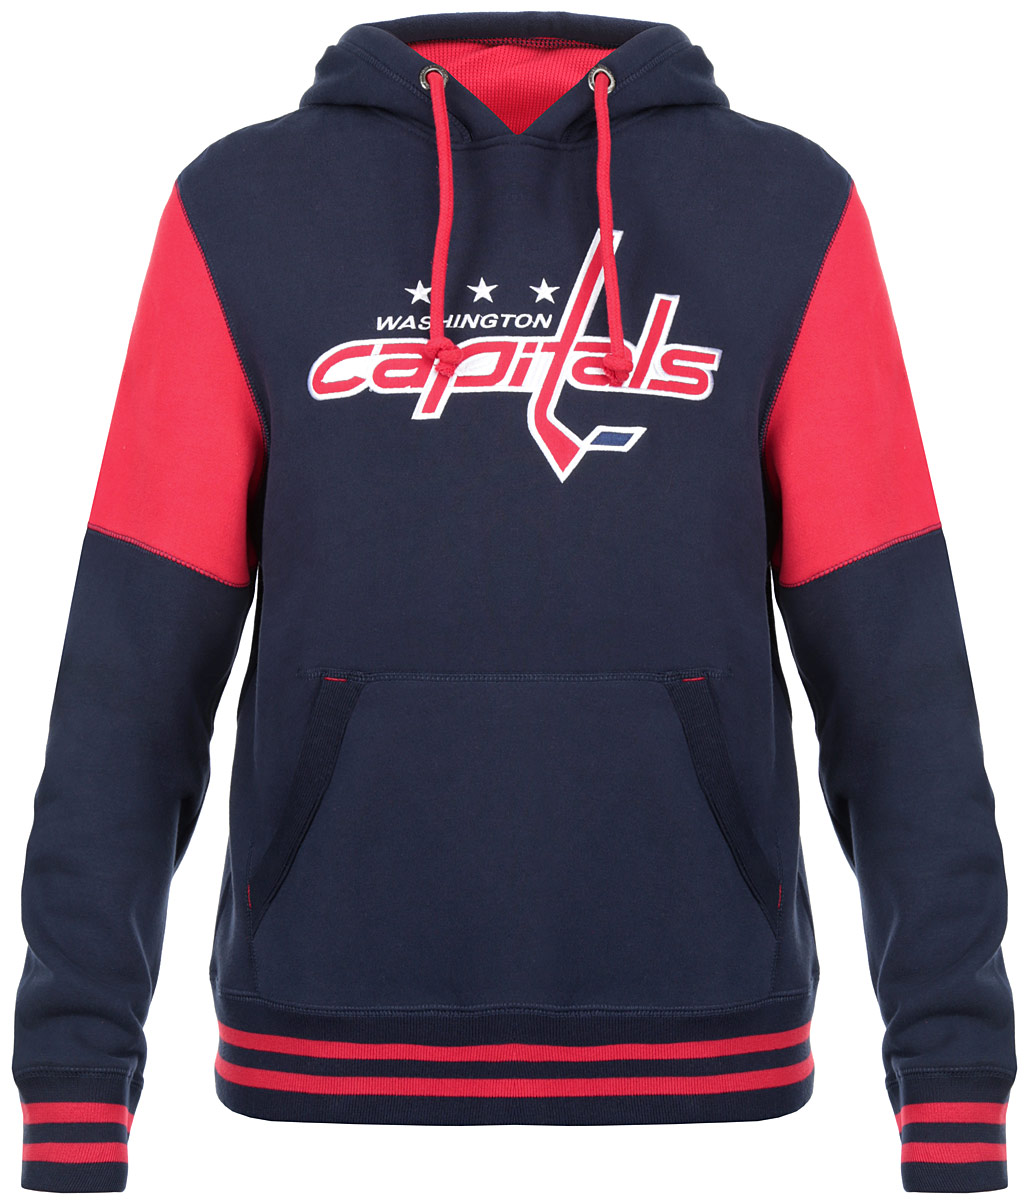 Толстовка мужская NHL Washington Capitsls, цвет:  темно-синий, красный.  35340.  Размер XS (44) NHL